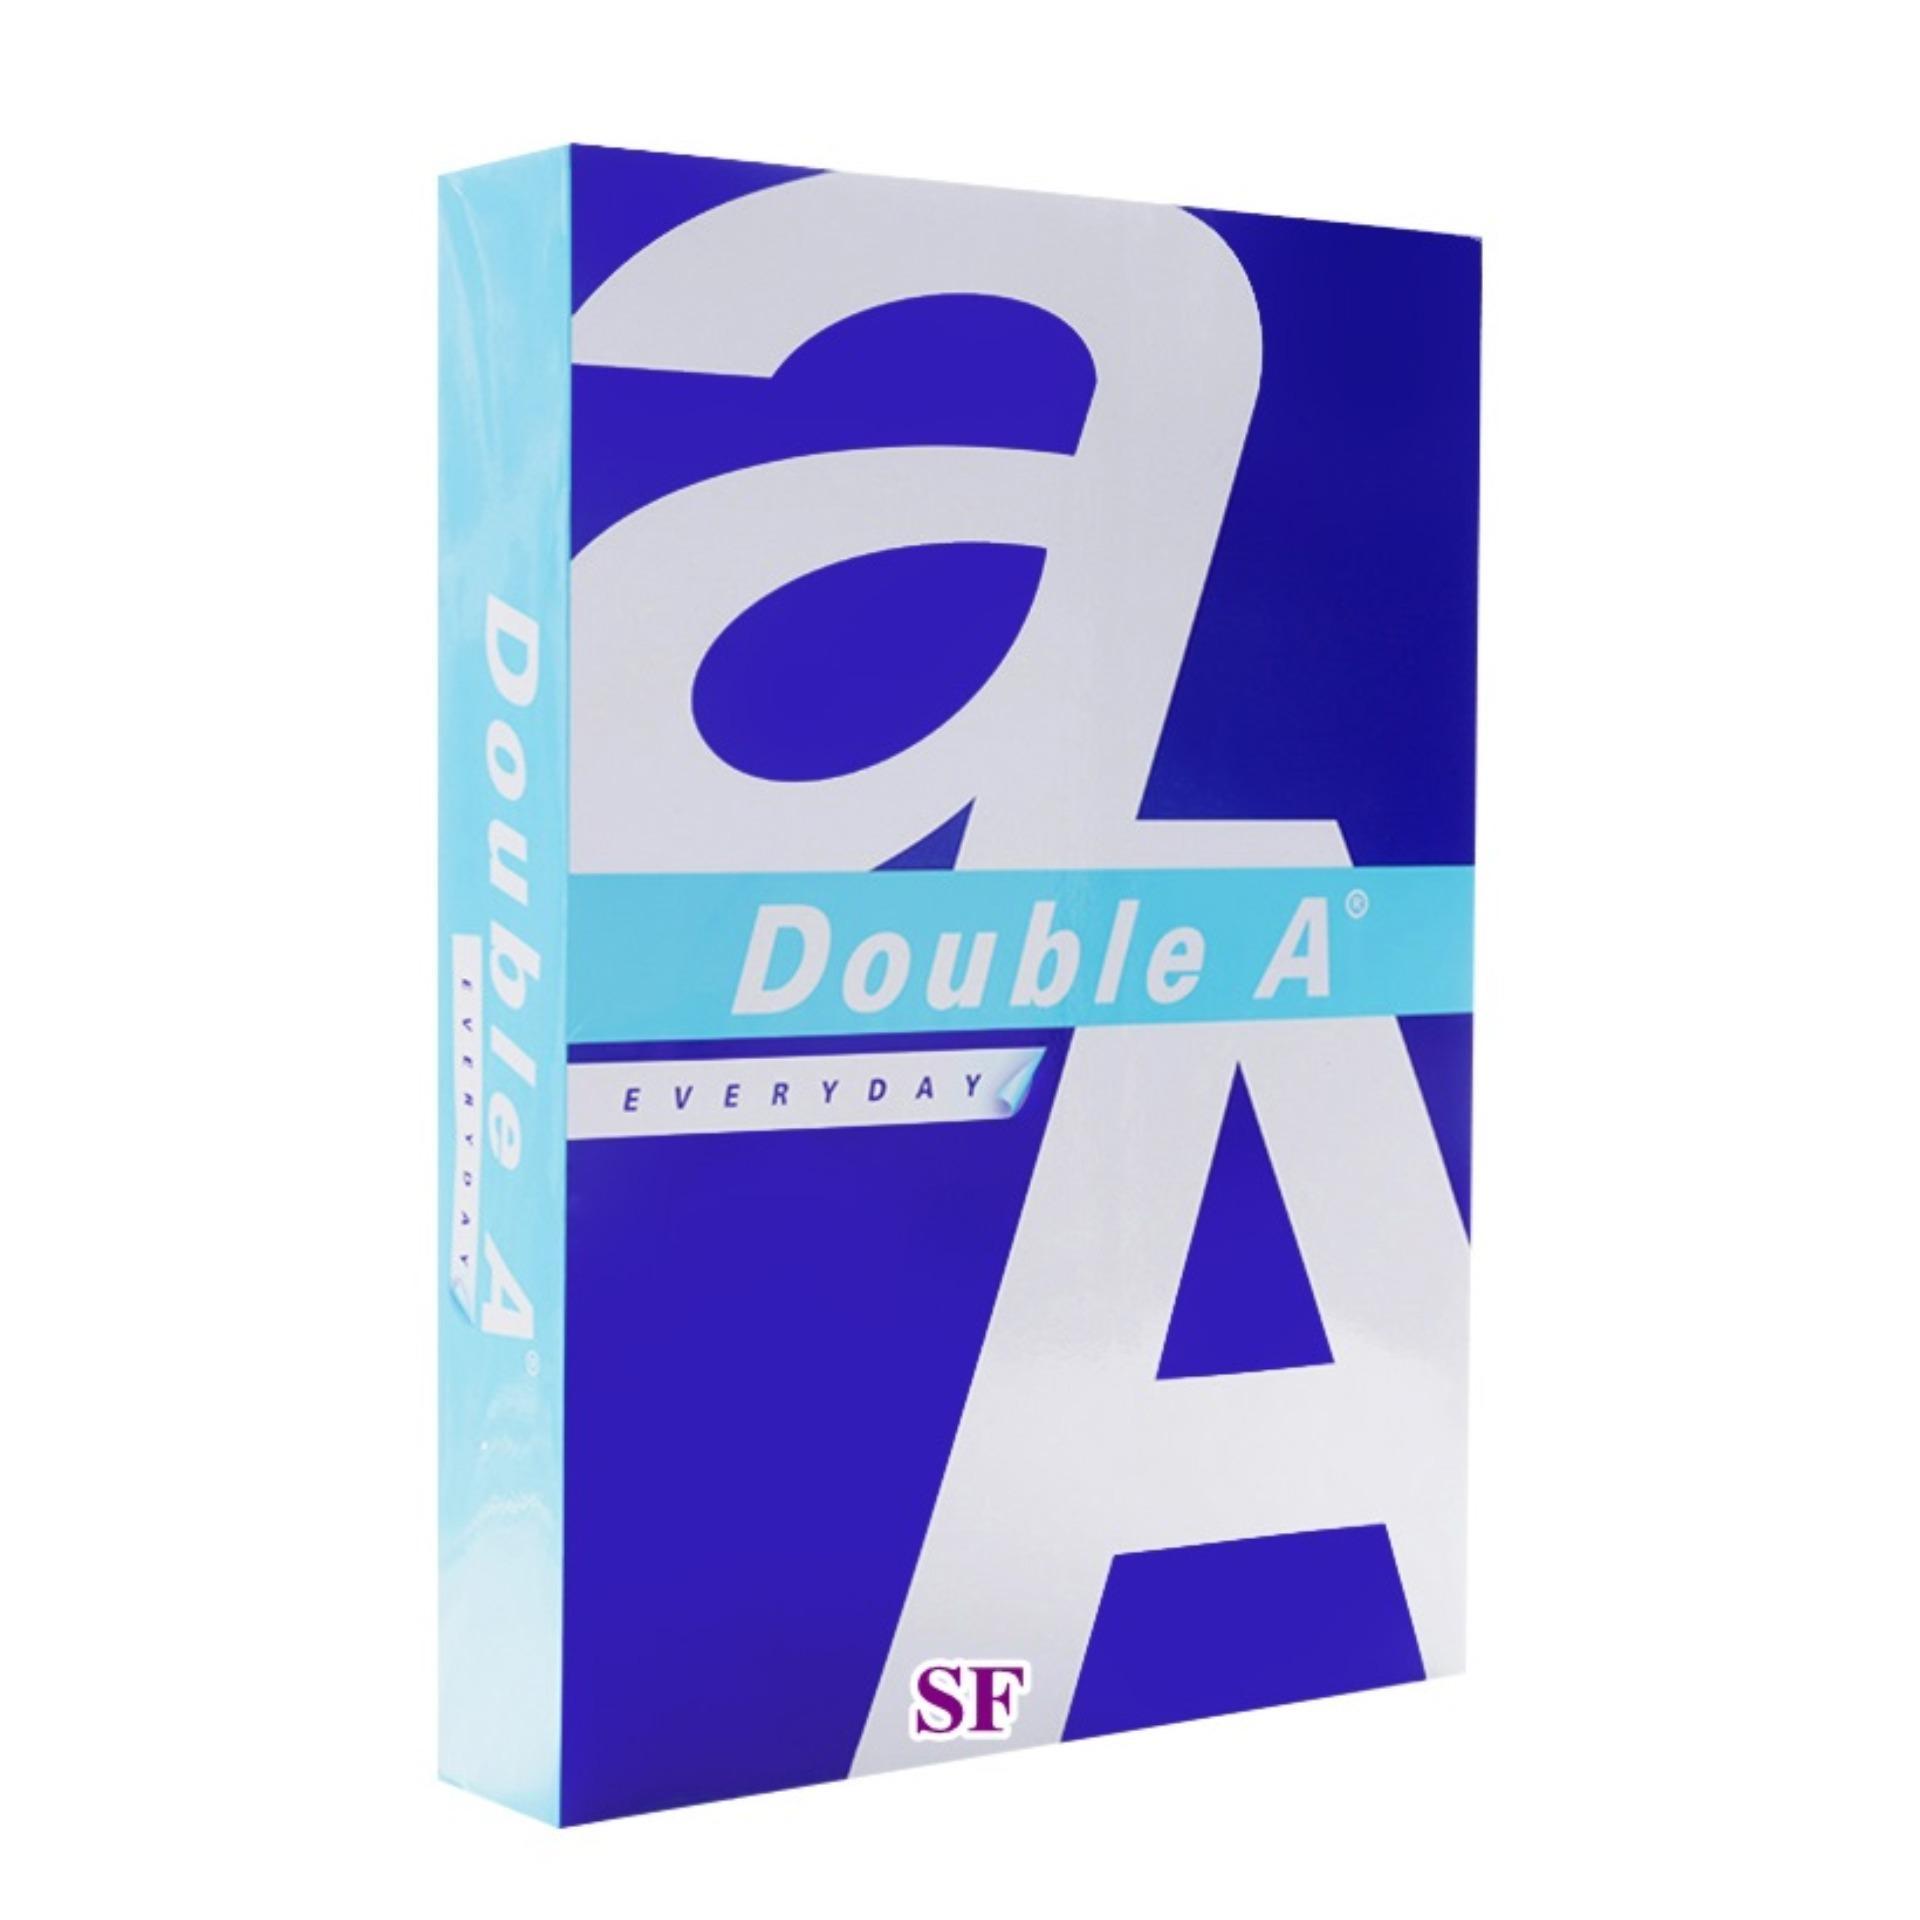 Chi tiết sản phẩm Giấy A4 Double A 70 gsm